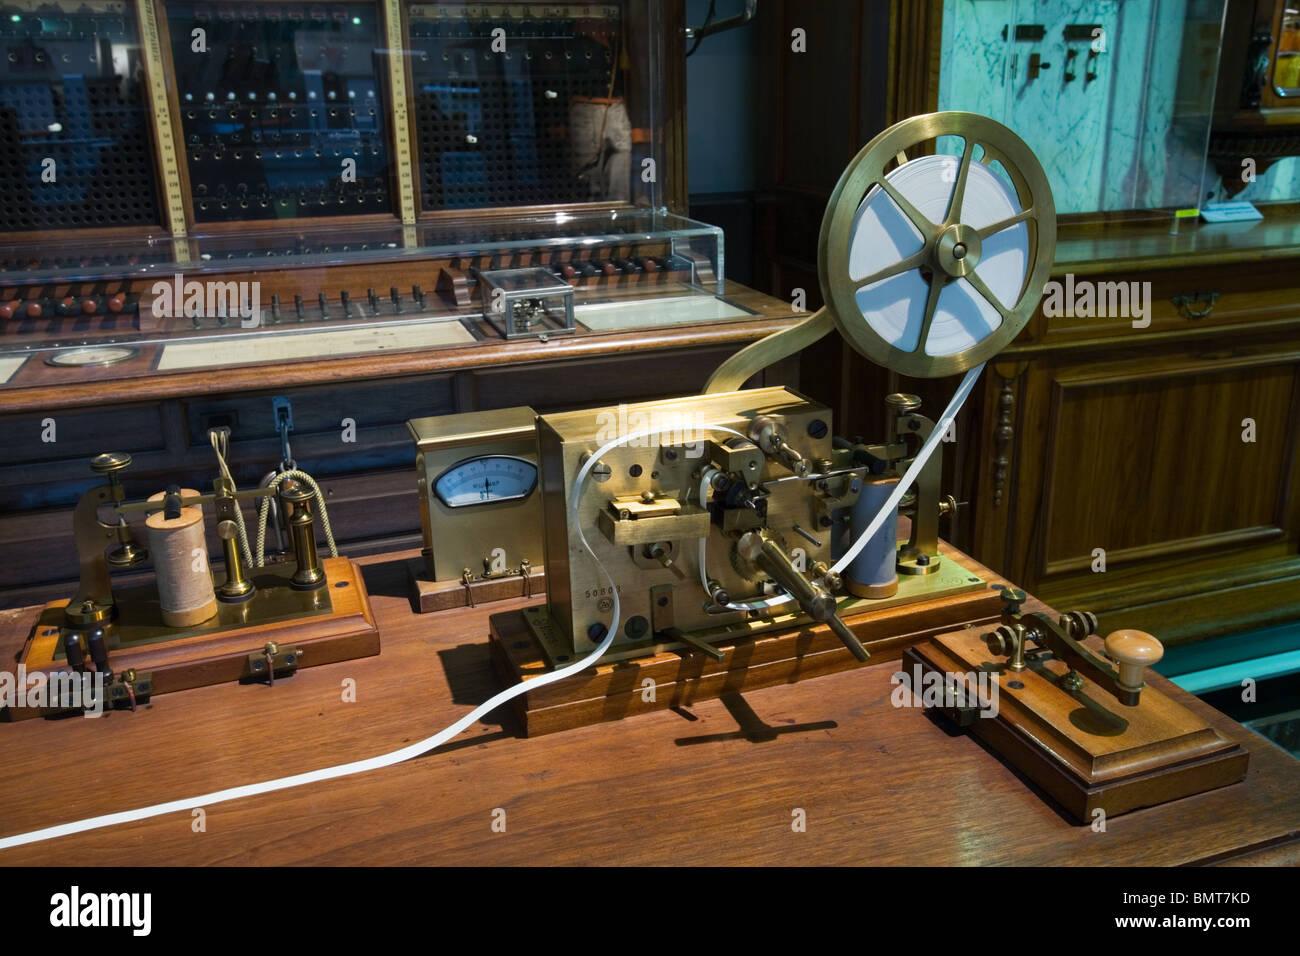 Morse telegraph machine, Vienna, Austria - Stock Image